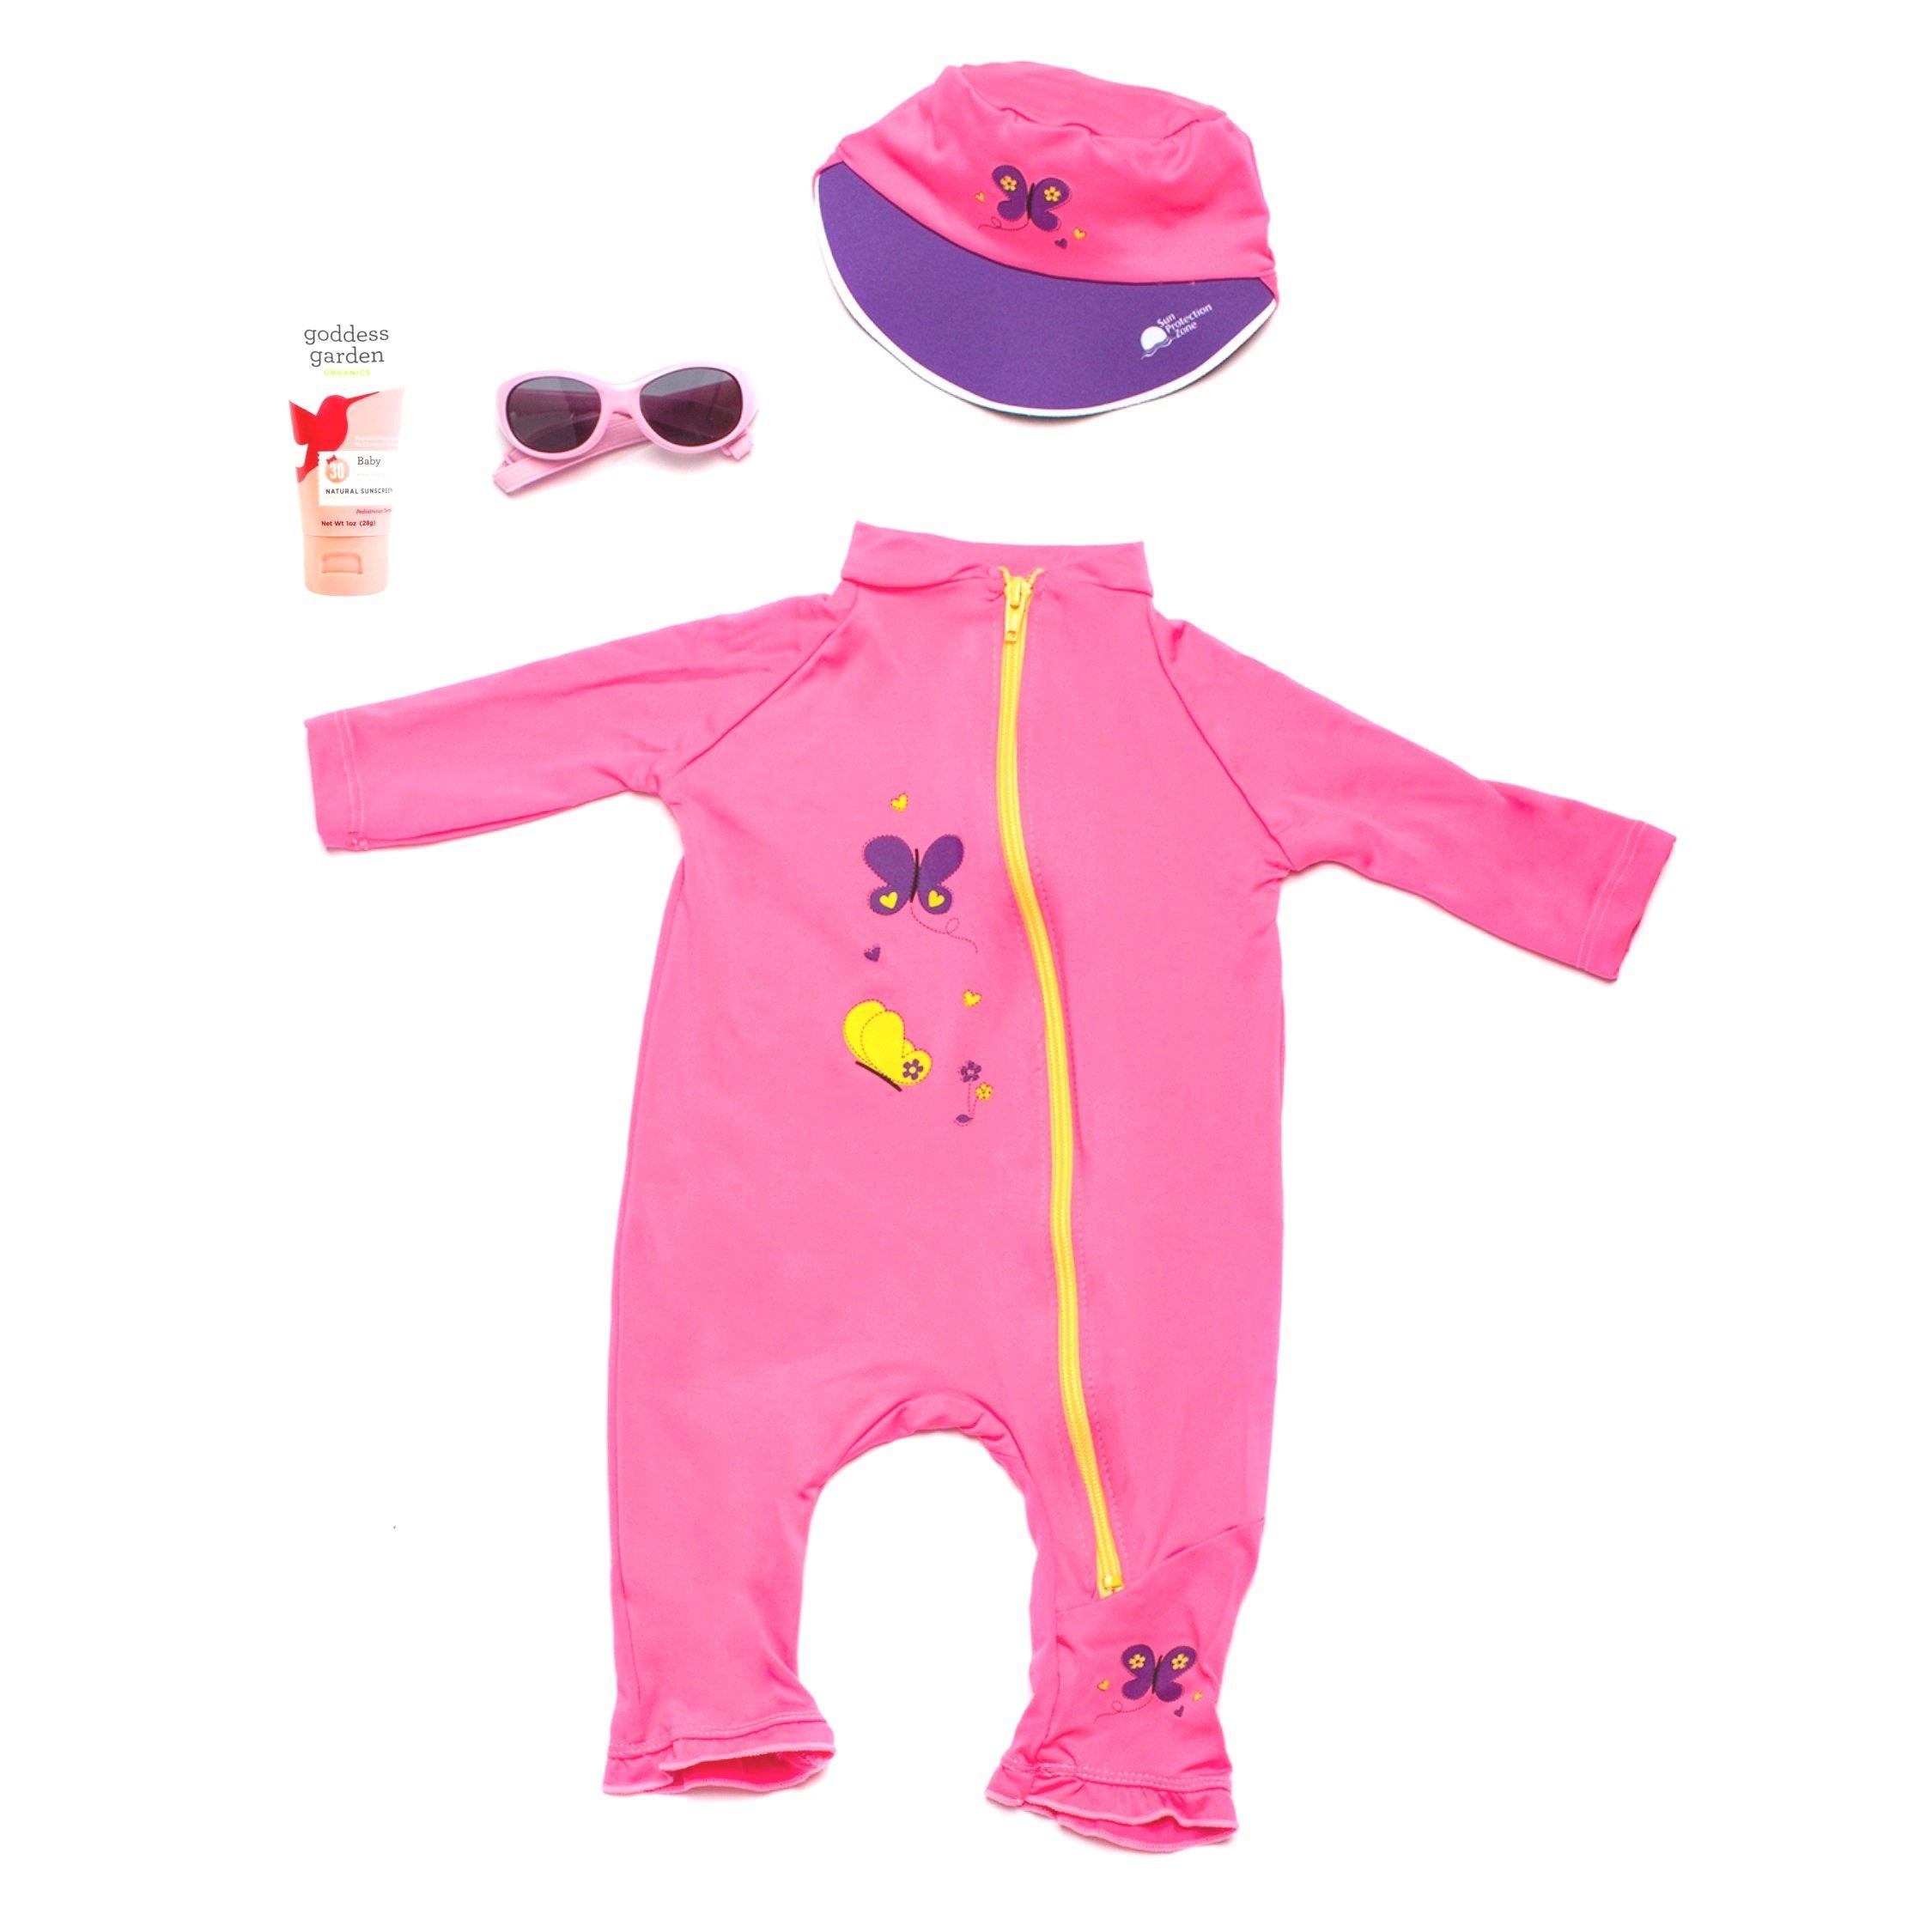 Baby's First Sun Day Infant Toddler Long Sleeve Sunsuit, Sun Cap, Sun Glasses and Goddess Garden Organics Sunscreen Kit (6 to 12 Months, Pink)